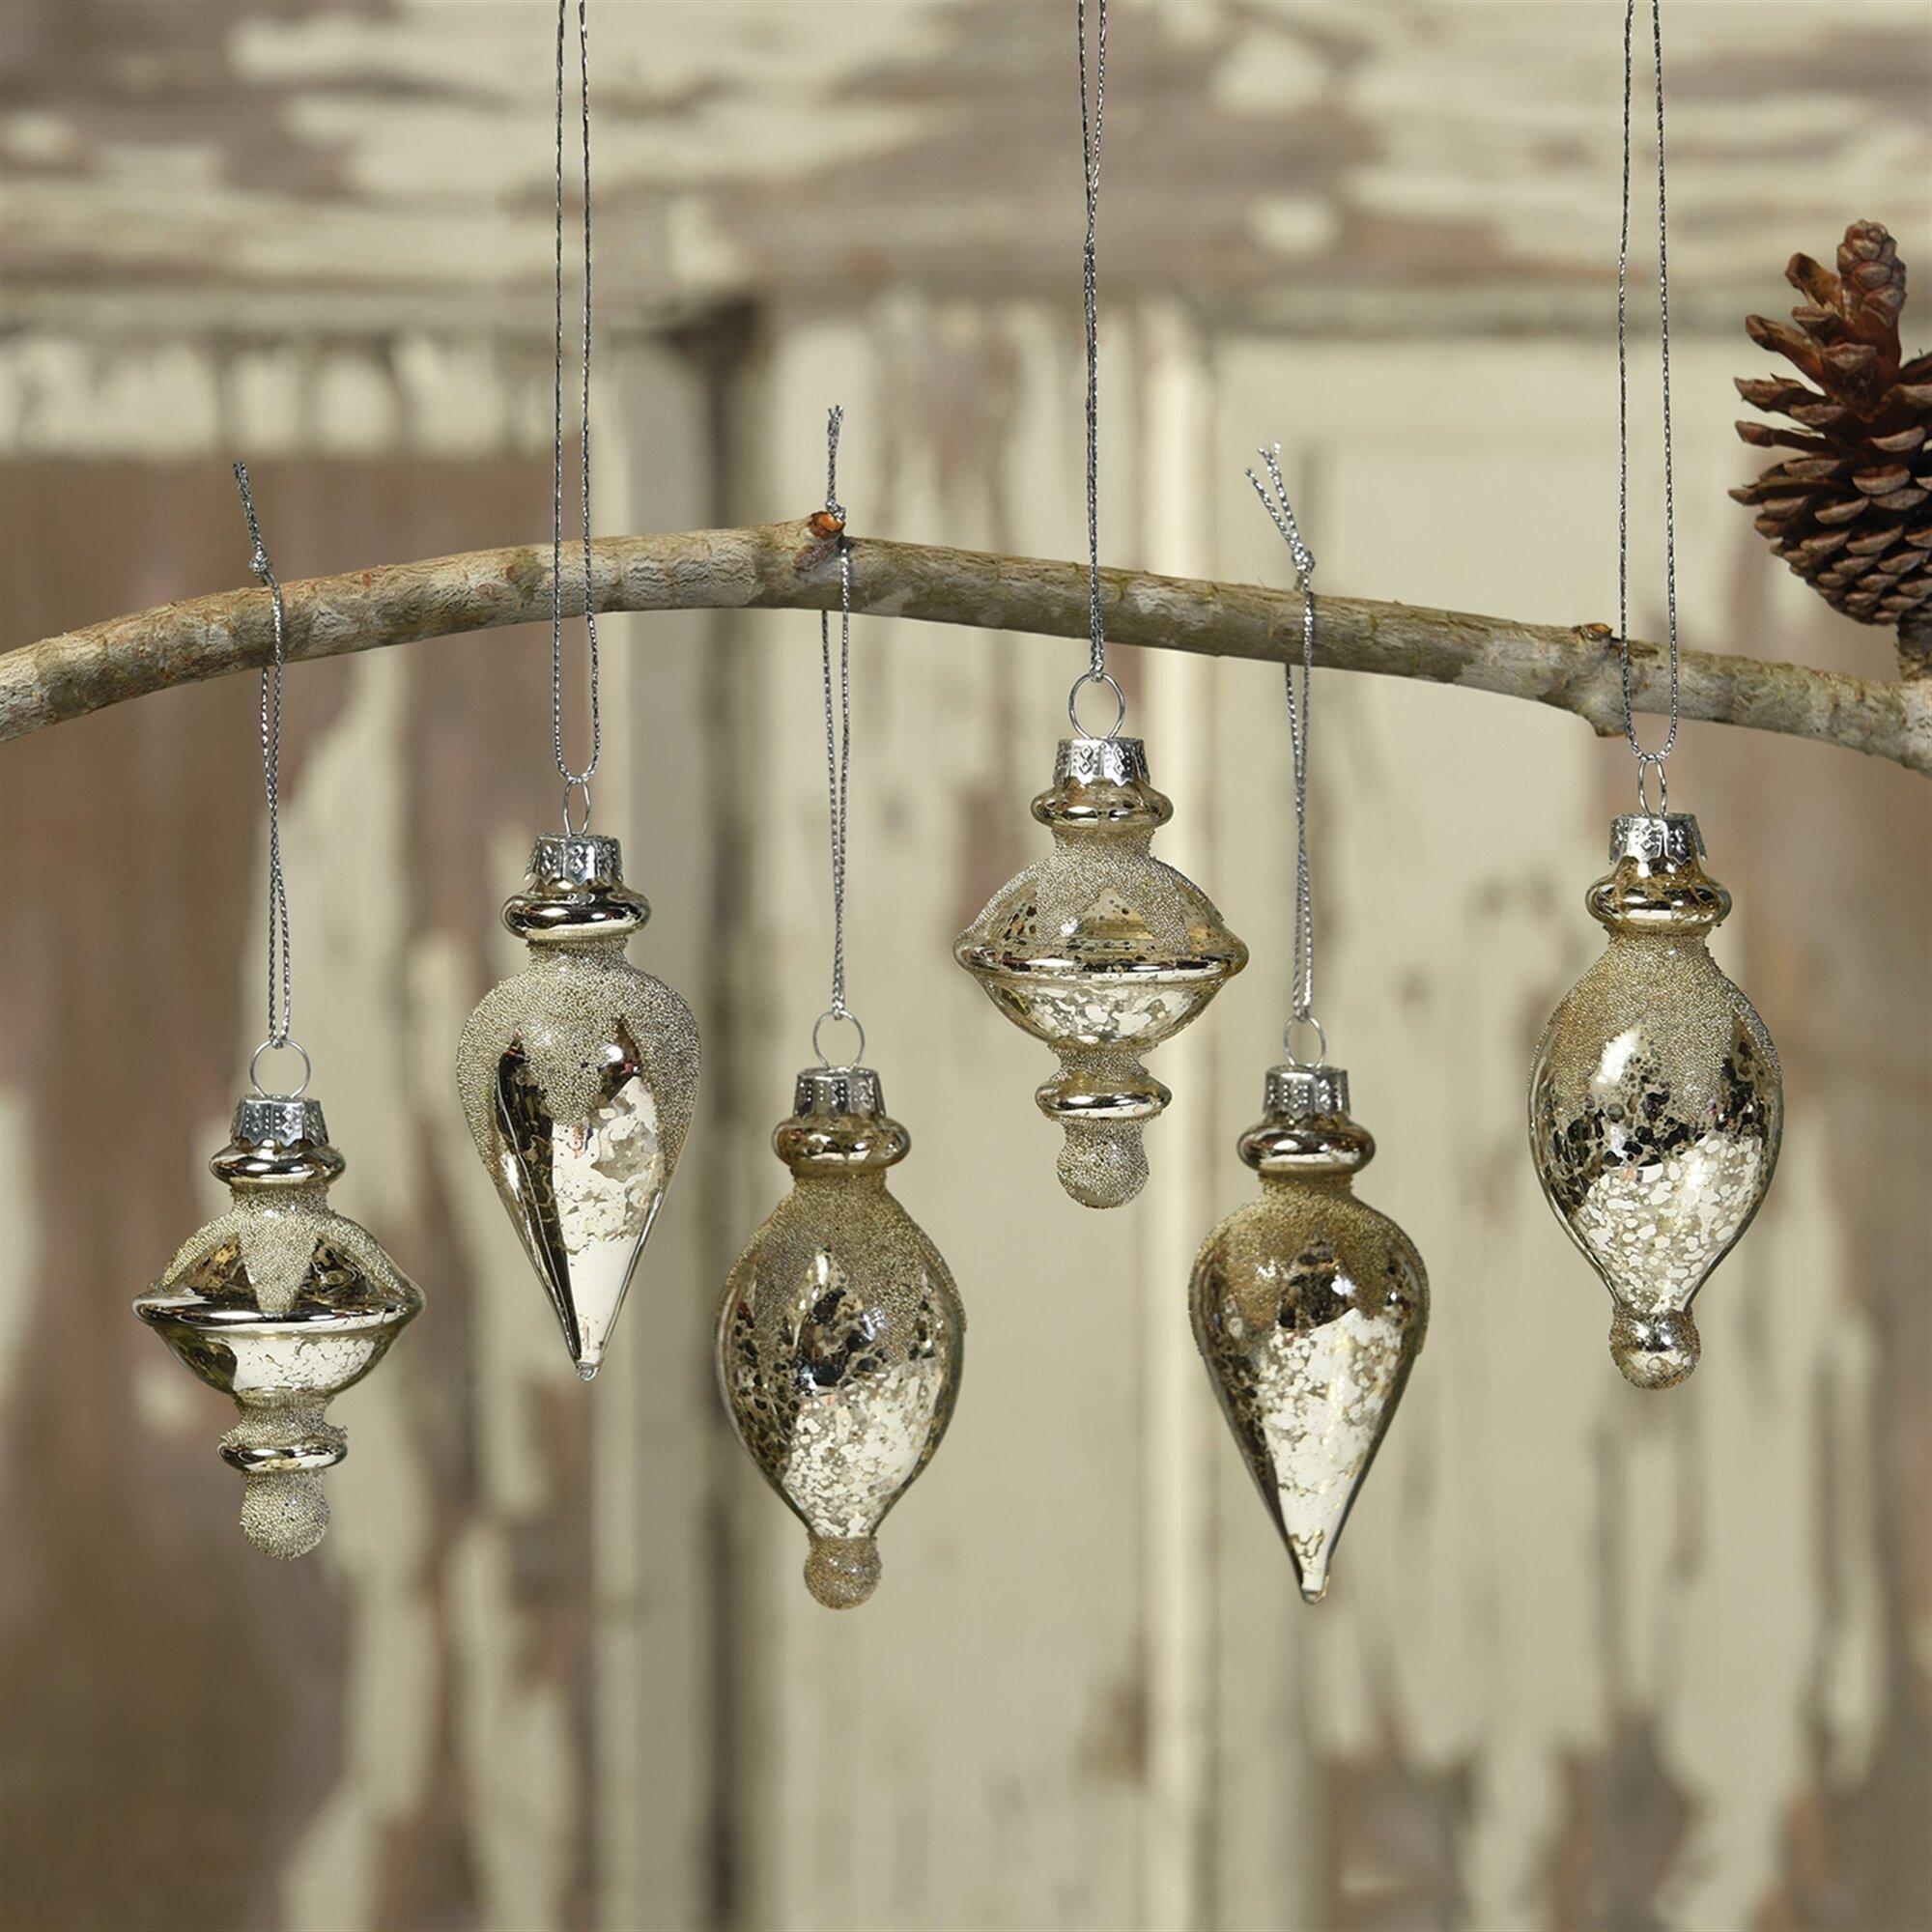 The Holiday Aisle 6 Piece Glass Finial Ornament Set Reviews Wayfair